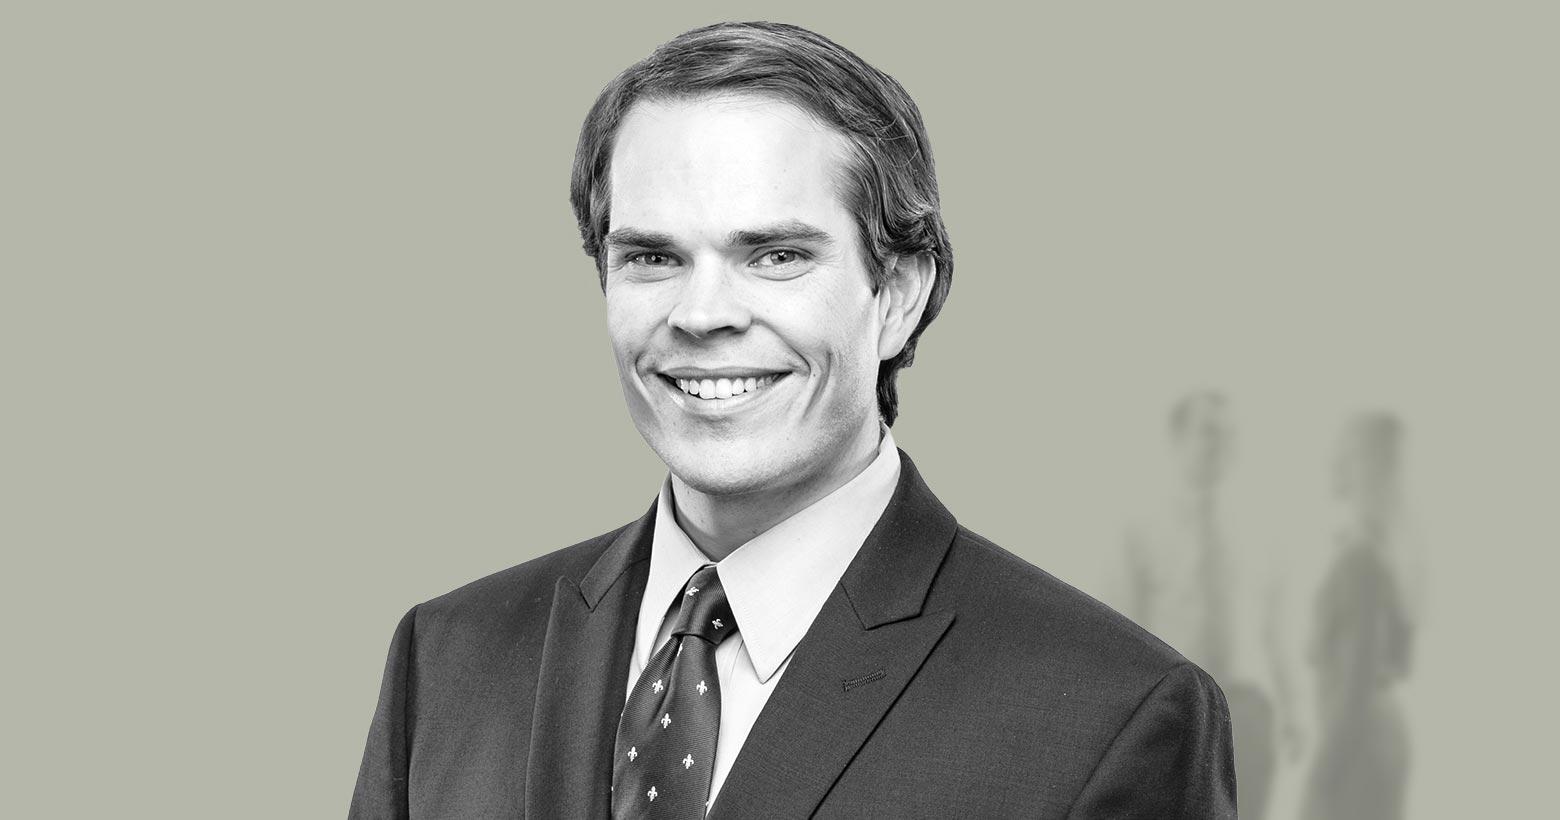 Jonathan D. Porter